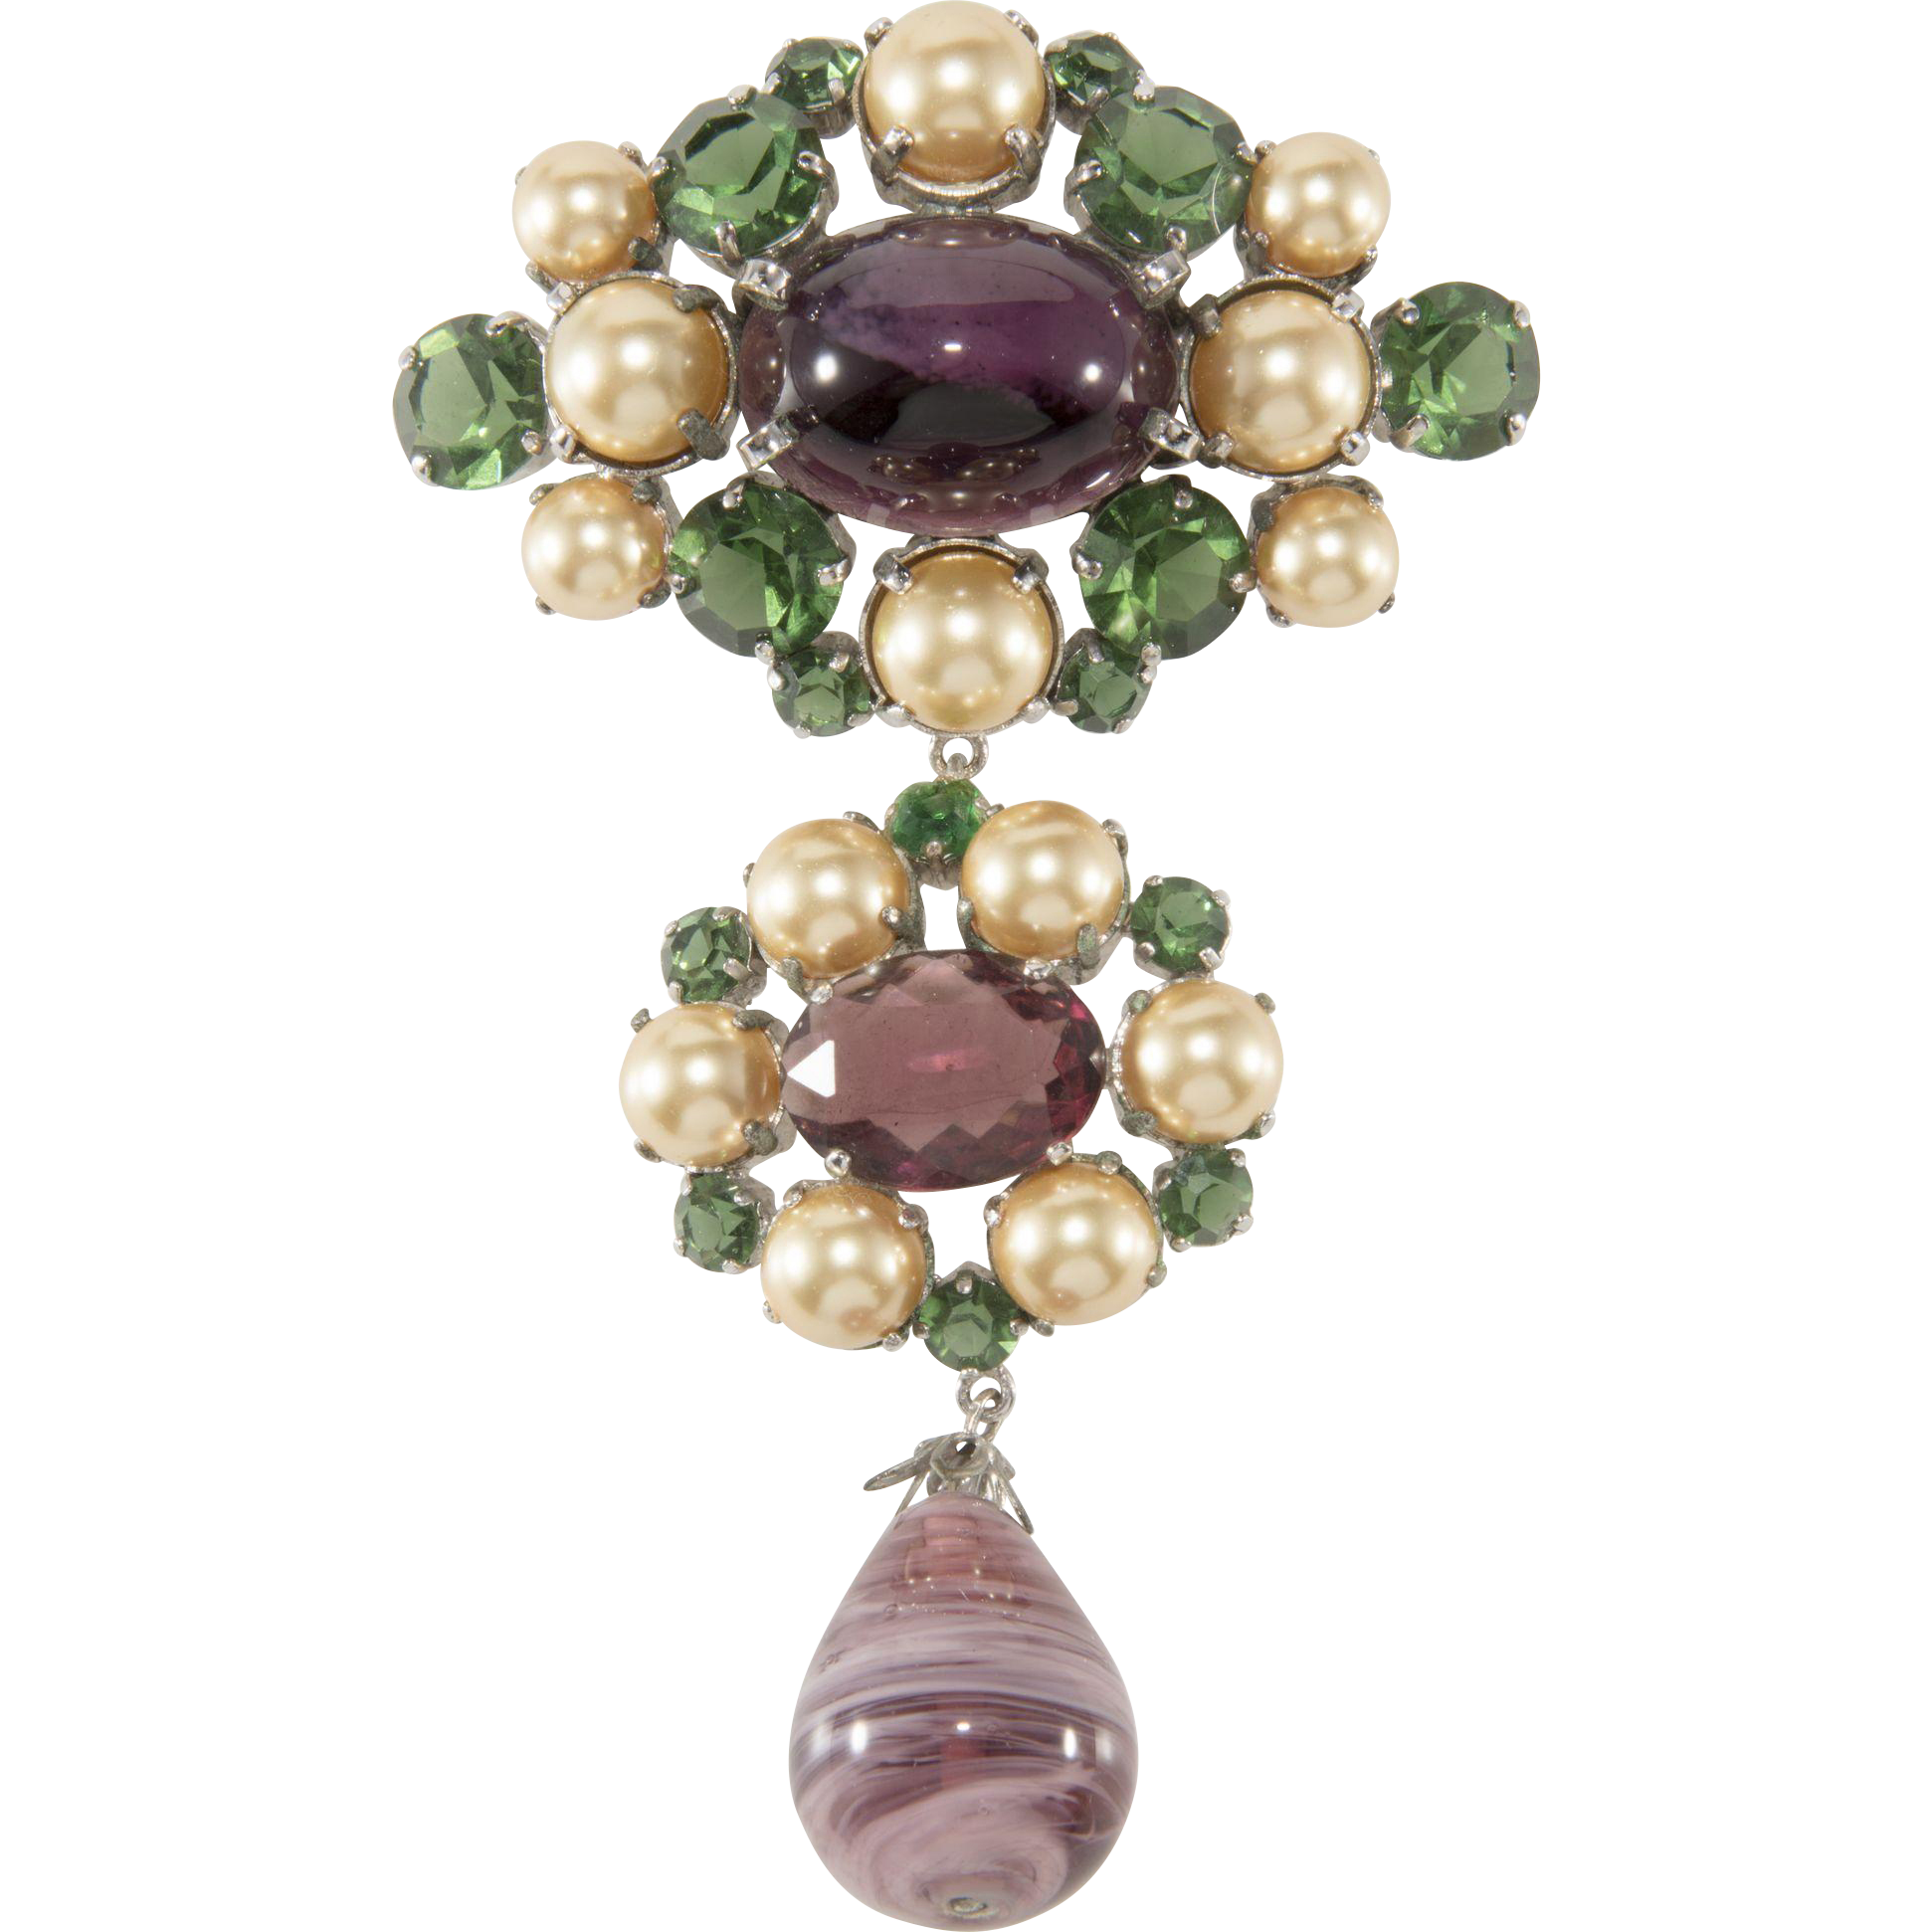 Christian Dior 4.25 Inch Purple and Green Glass Dangle Brooch Pin 1960